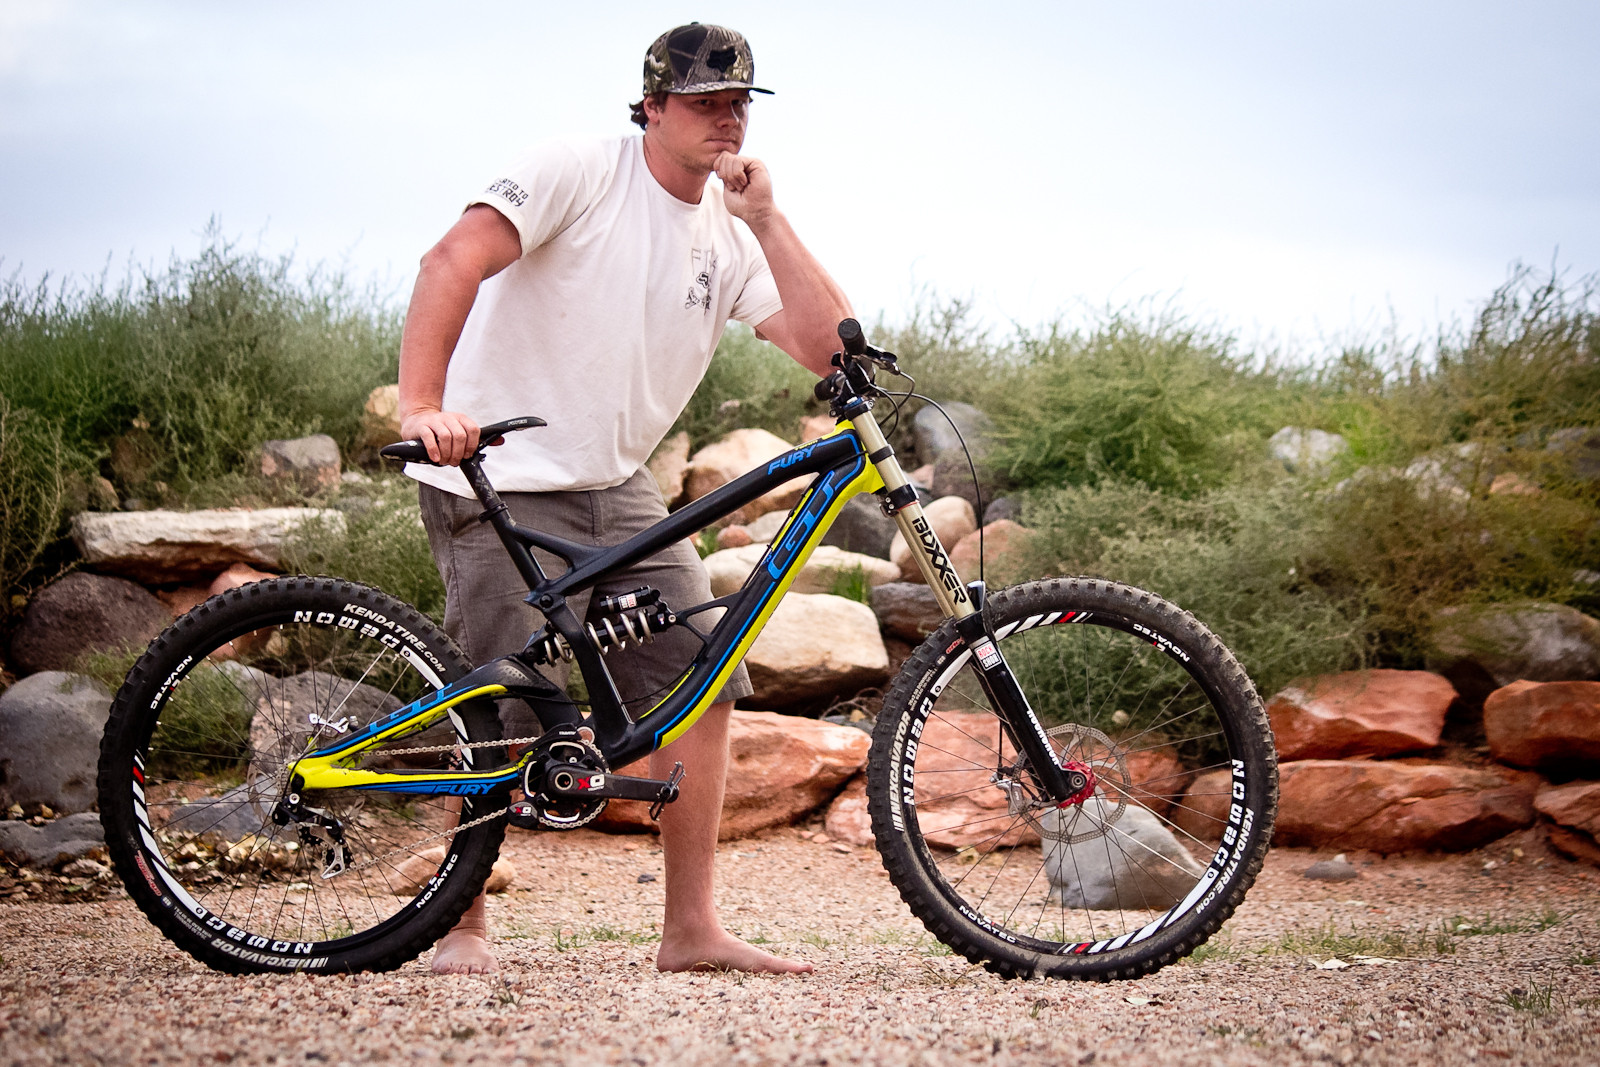 Rampage Pro Bike: Kyle Strait's 2014 GT Fury - Rampage Pro Bike: Kyle Strait's GT Fury - Mountain Biking Pictures - Vital MTB